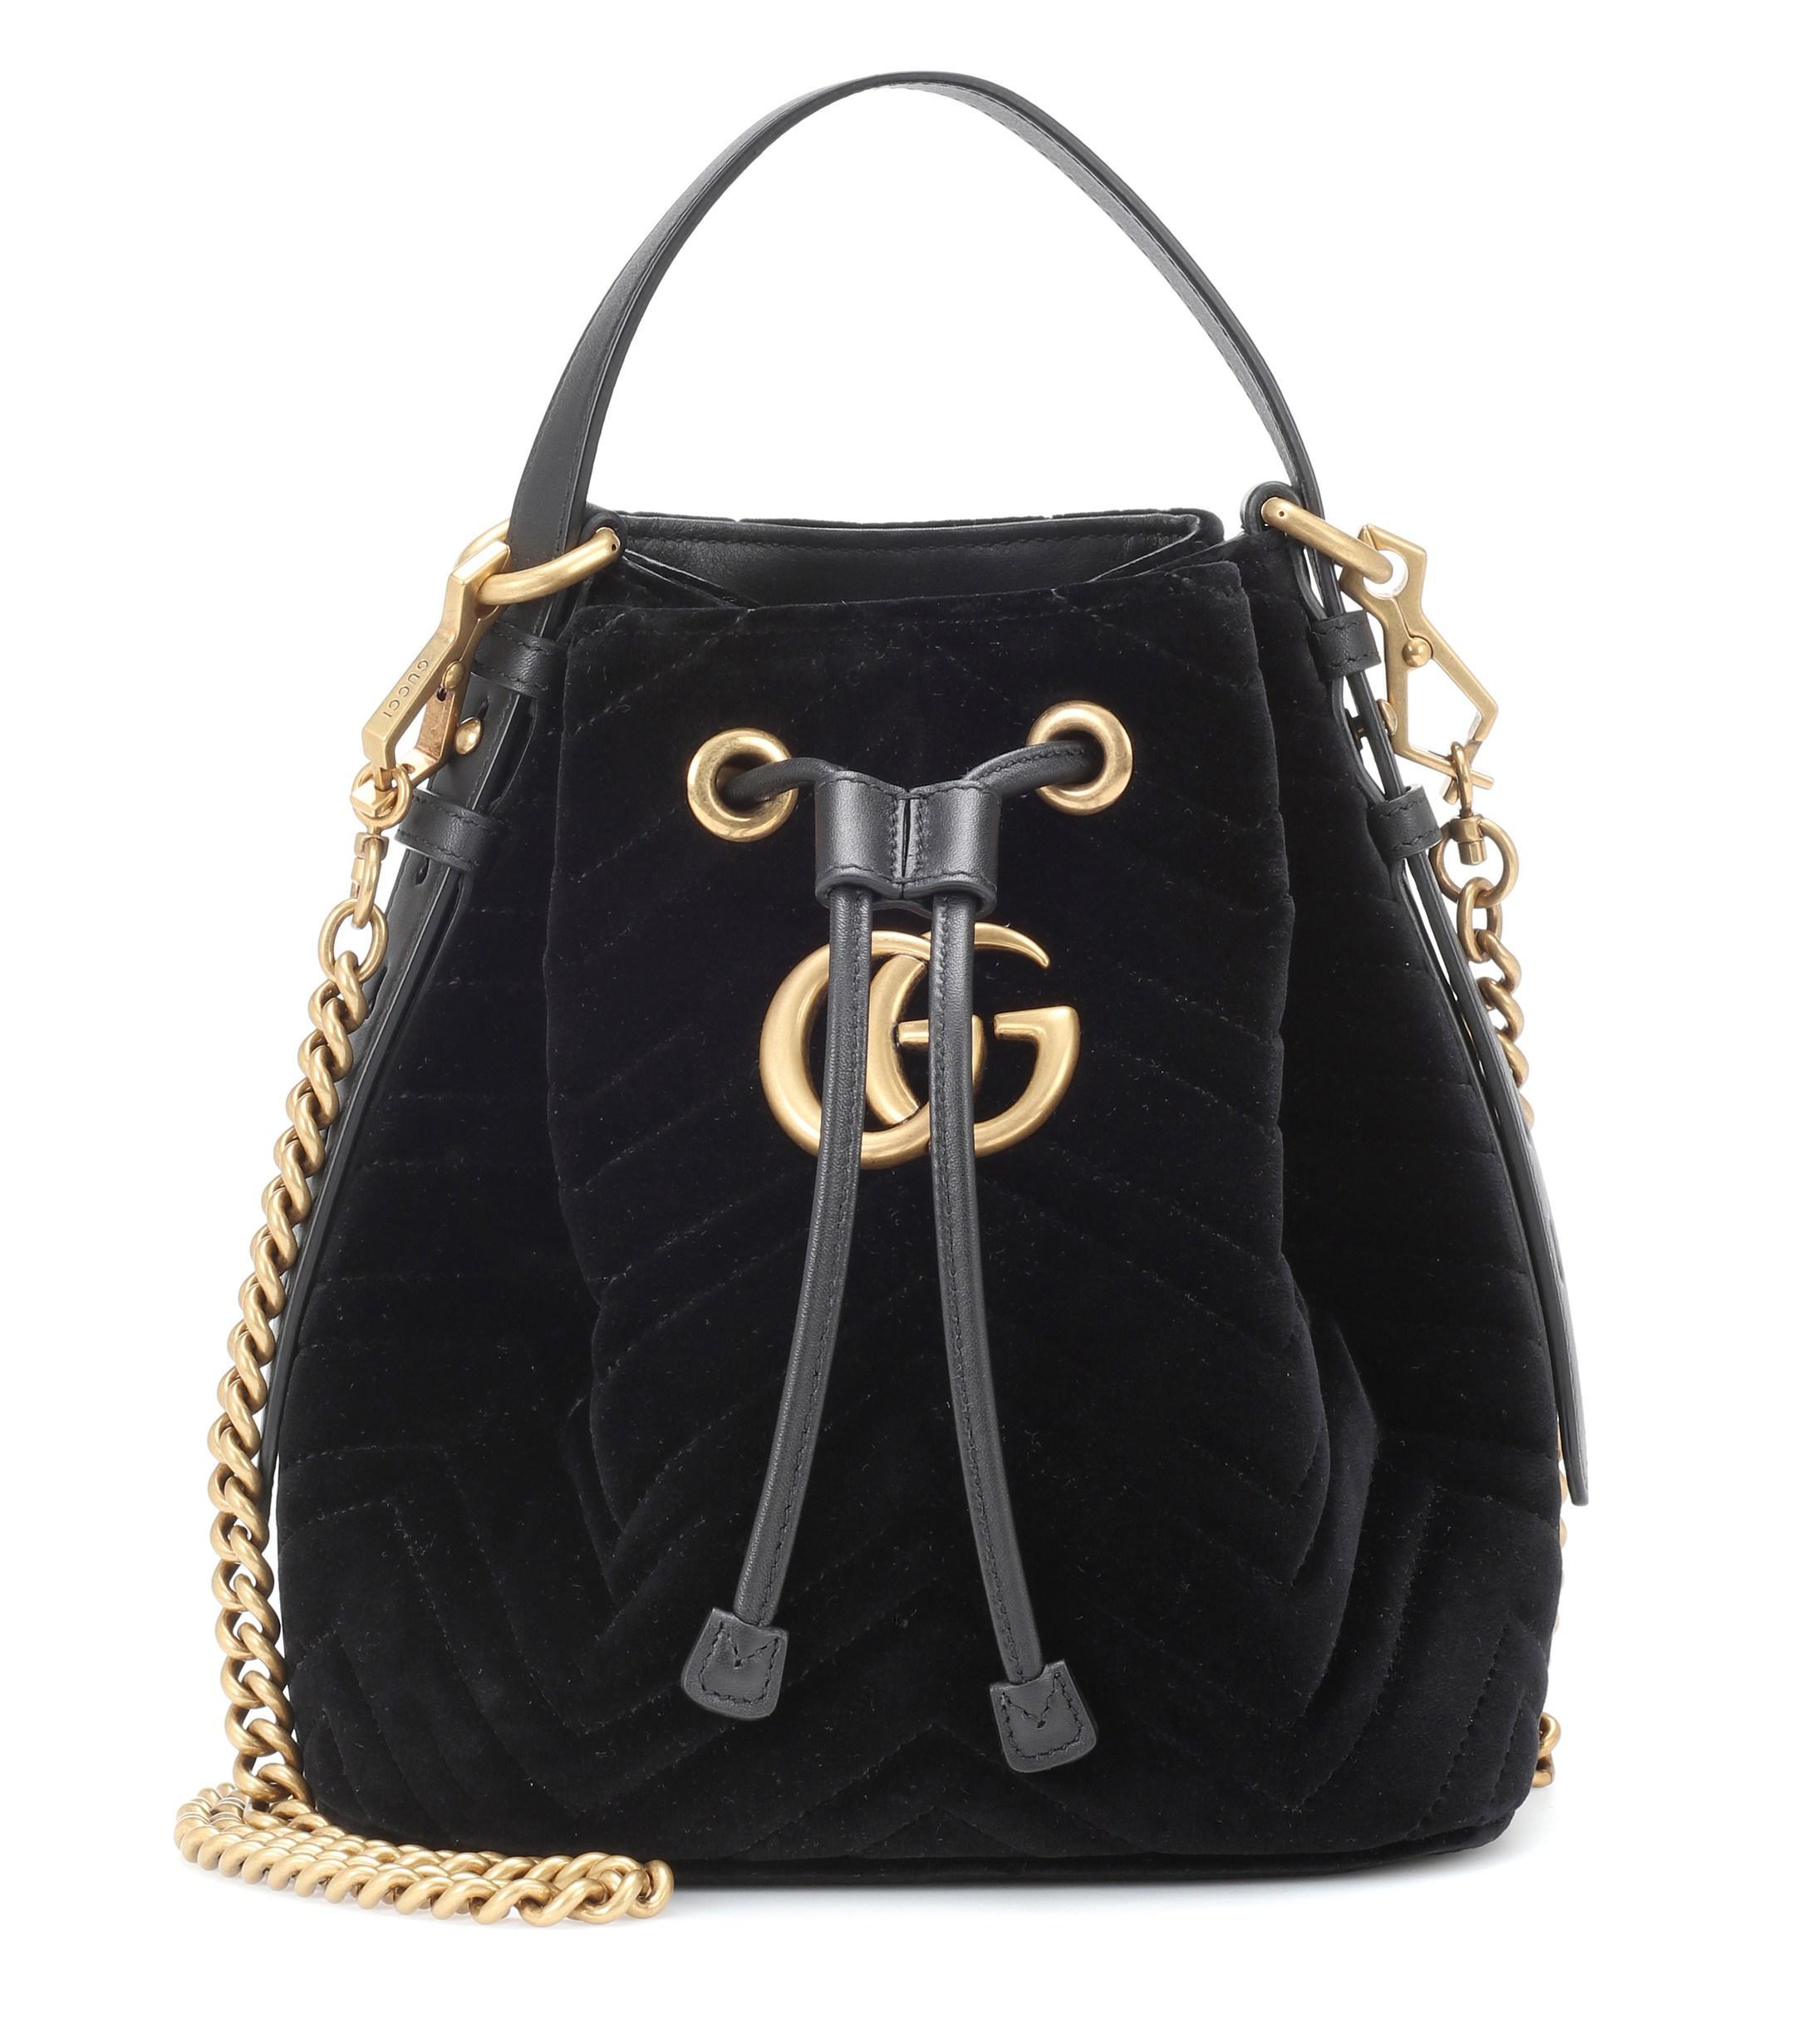 b67013ff9 ... Gucci - Black GG Marmont Velvet Bucket Bag - Lyst. Visit Mytheresa. Tap  to visit site